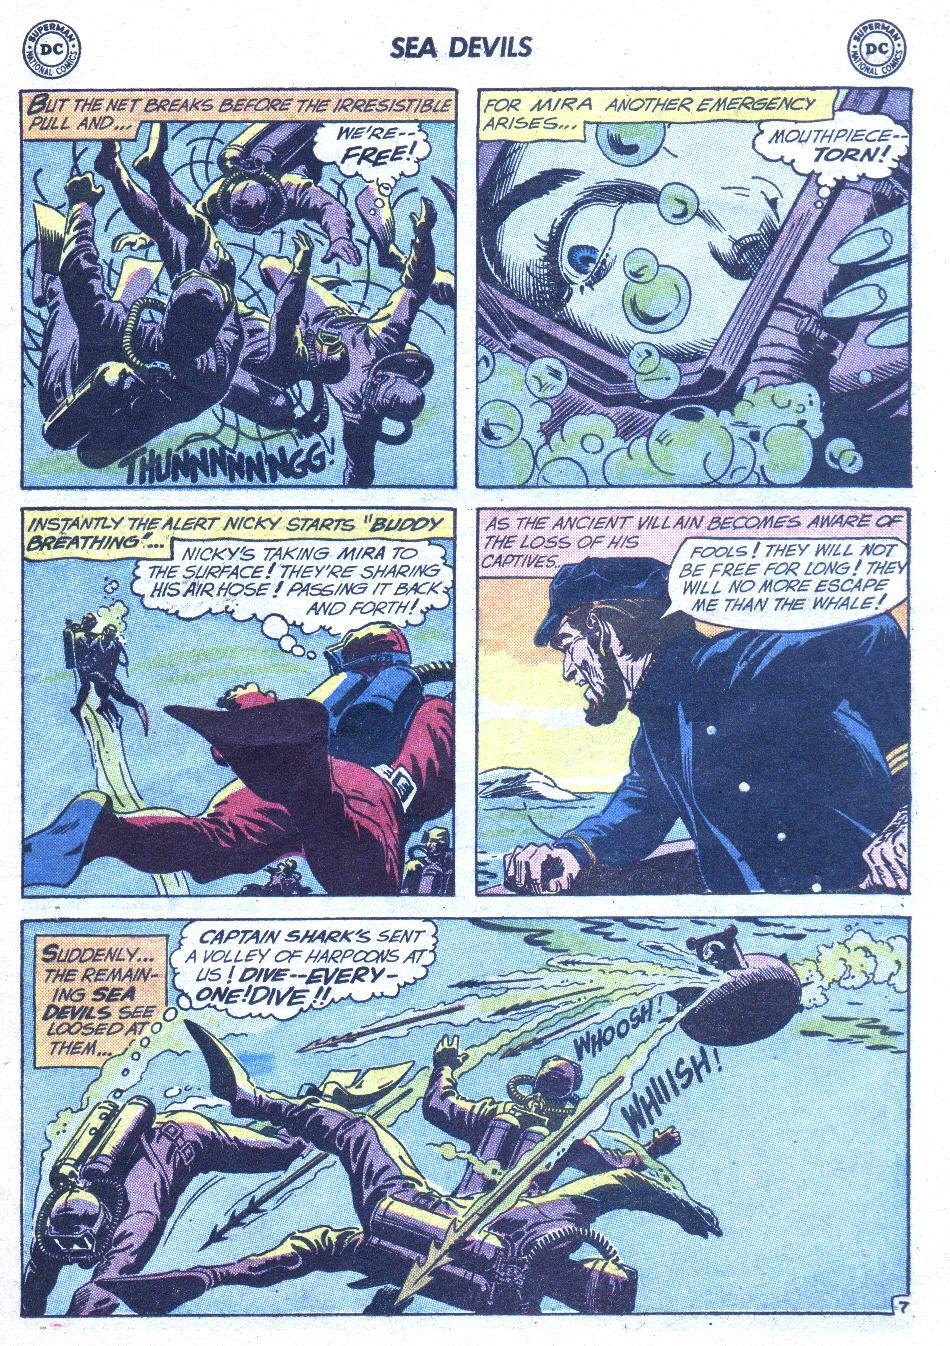 Read online Sea Devils comic -  Issue #1 - 28